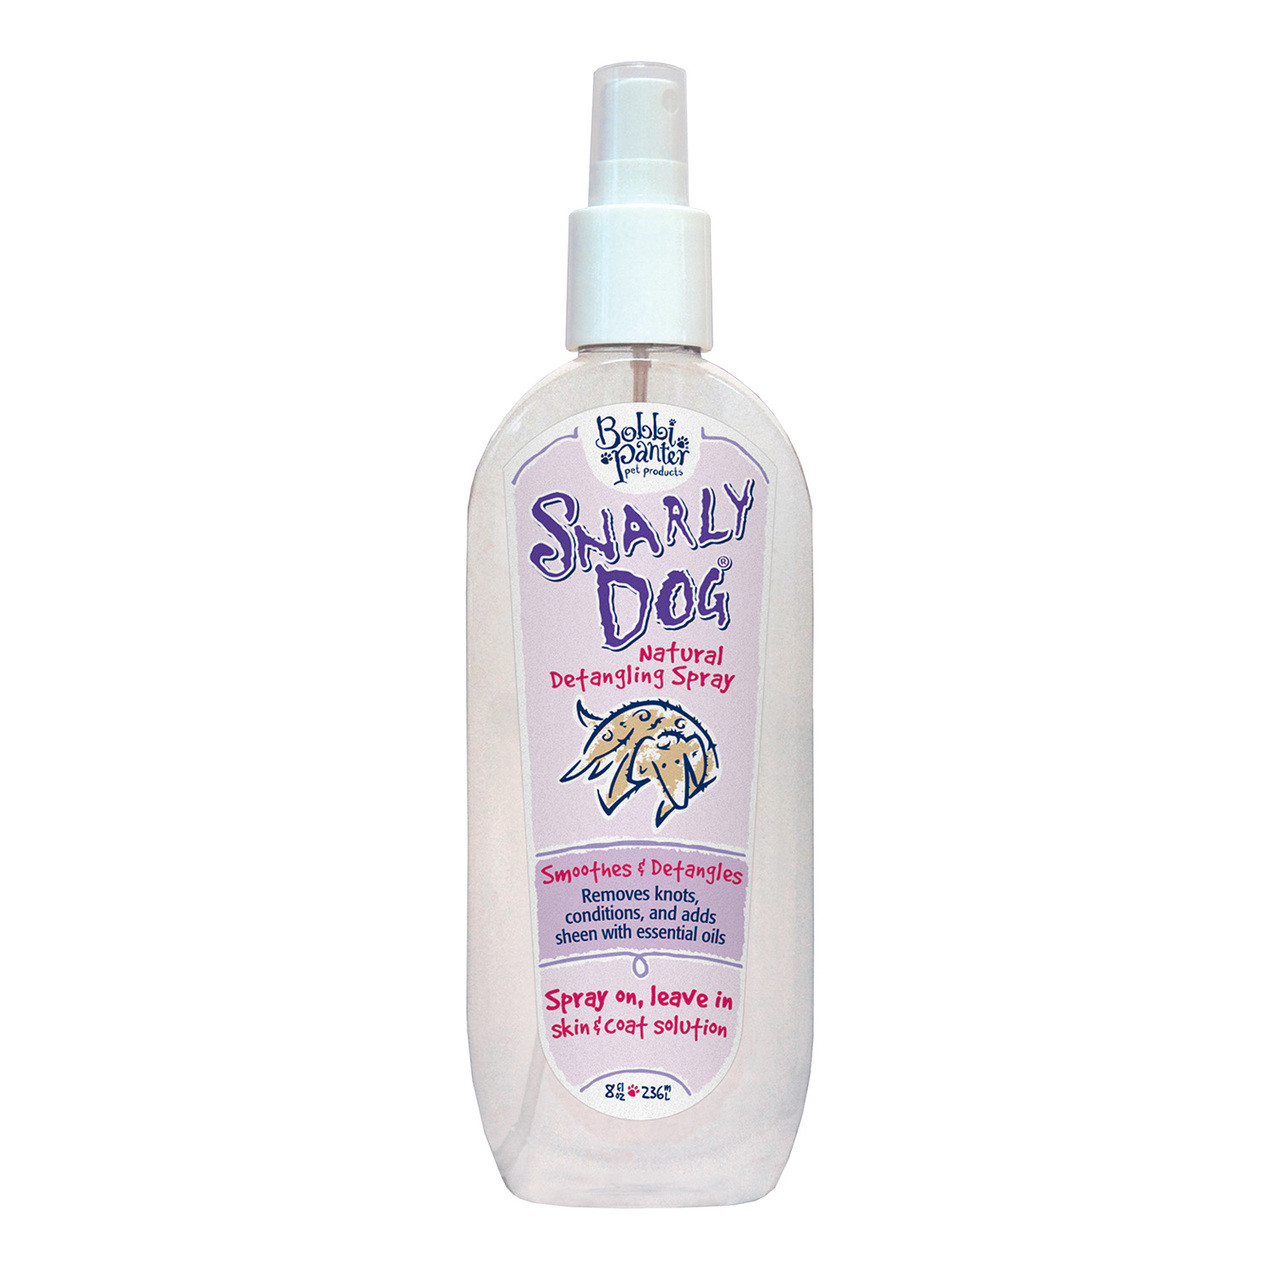 Bobbi Panter Snarly Dog Detangling Spray